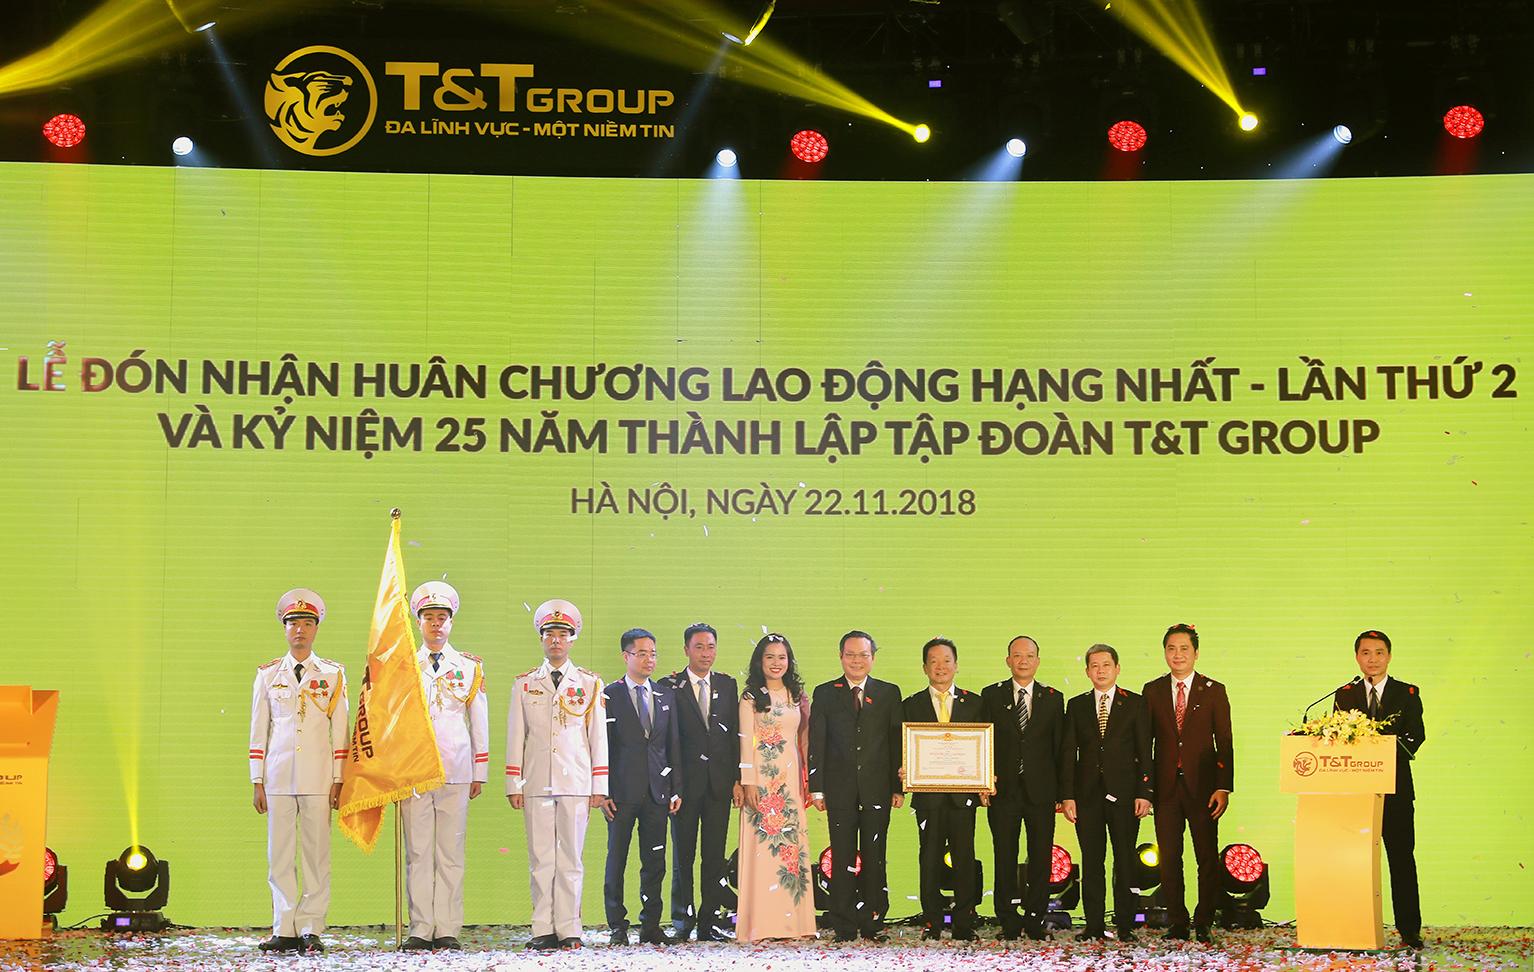 Kỷ niệm 25 năm tập đoàn T&T